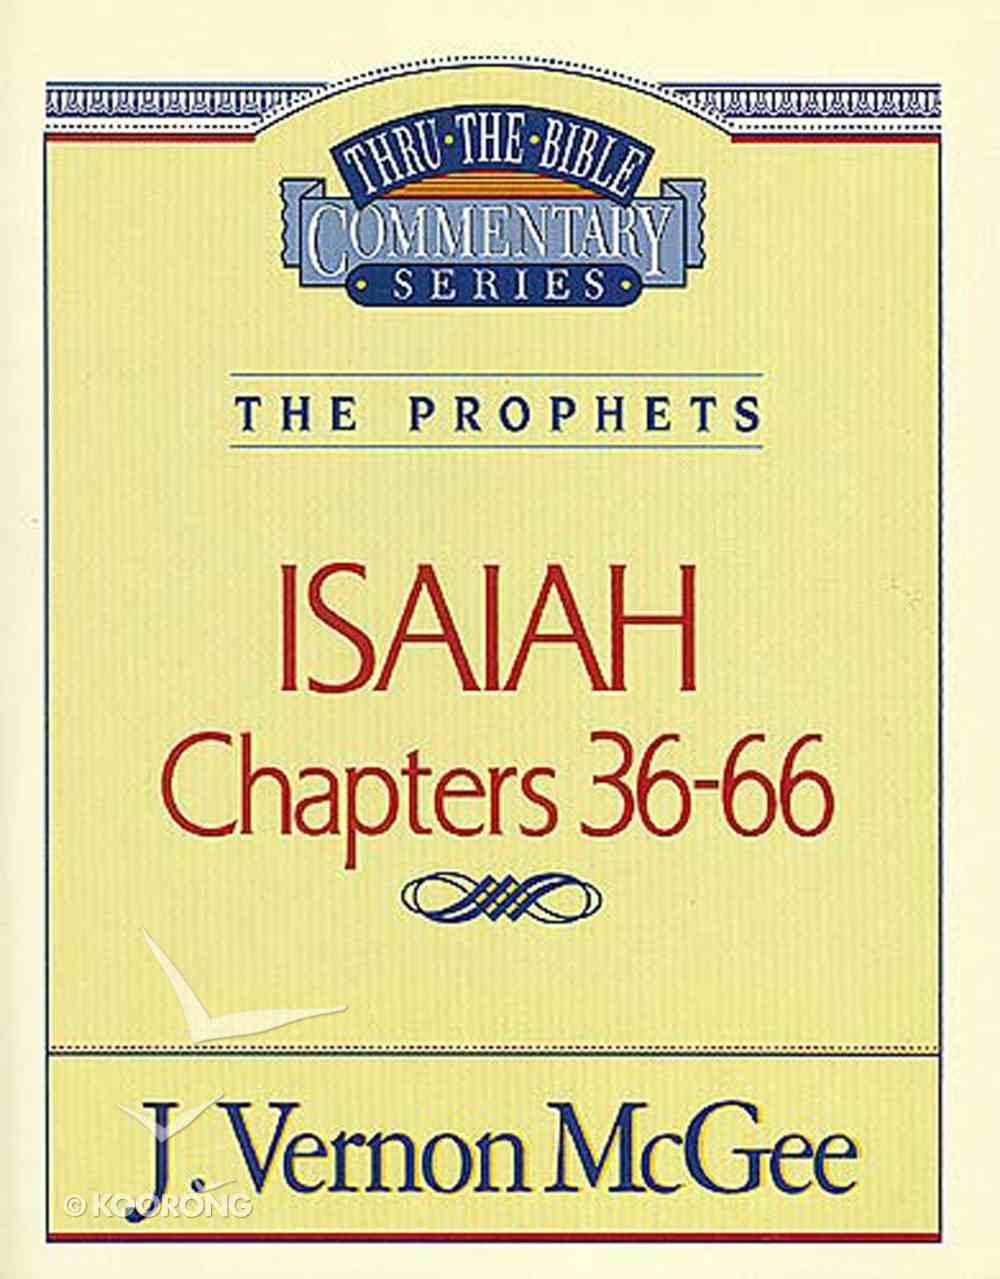 Thru the Bible OT #23: Isaiah (Volume 2) (#23 in Thru The Bible Old Testament Series) eBook